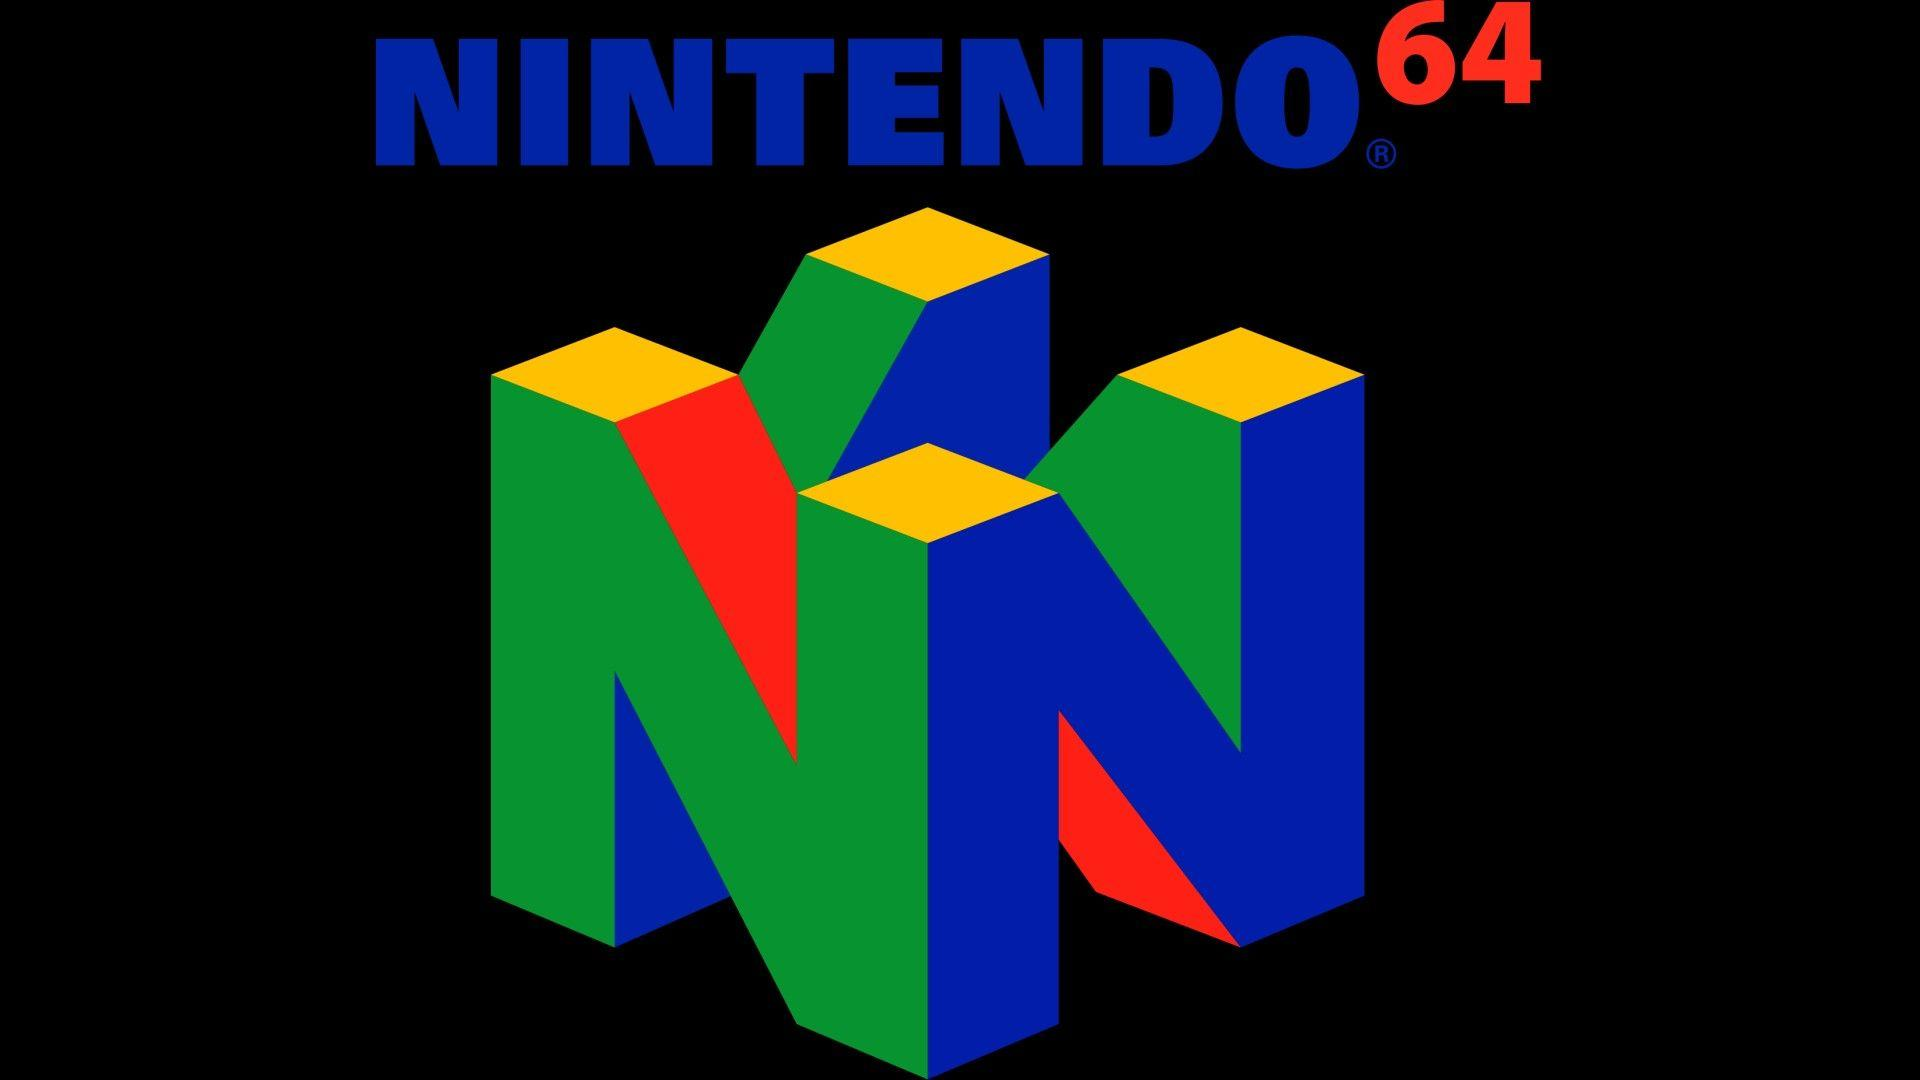 Nintendo 64 Wallpapers Top Free Nintendo 64 Backgrounds Wallpaperaccess